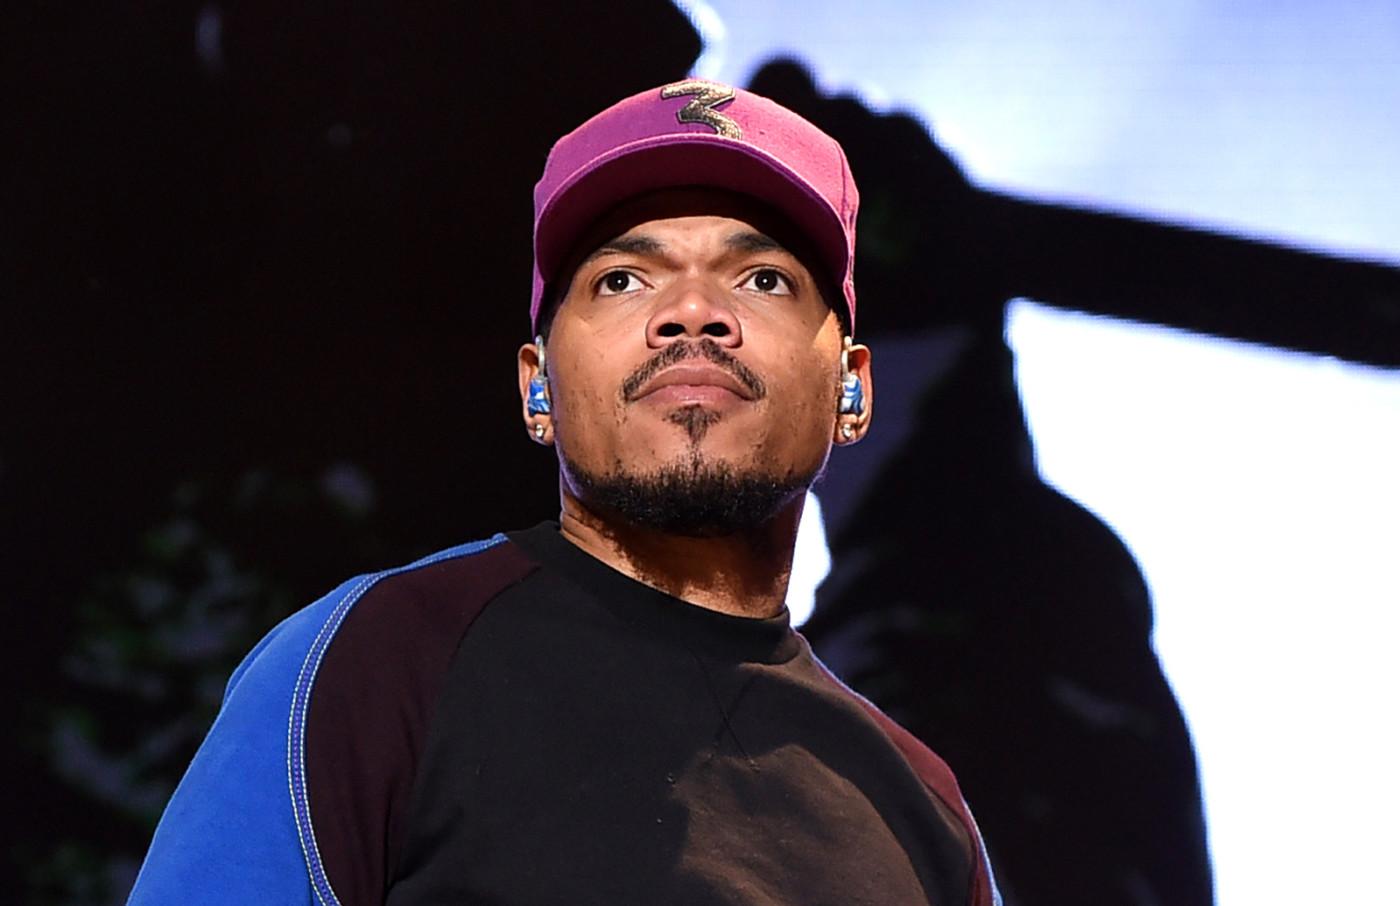 So Sweet! Chance The Rapper 為了芝加哥的鄉親量身打造了一場虛擬演唱會! 4